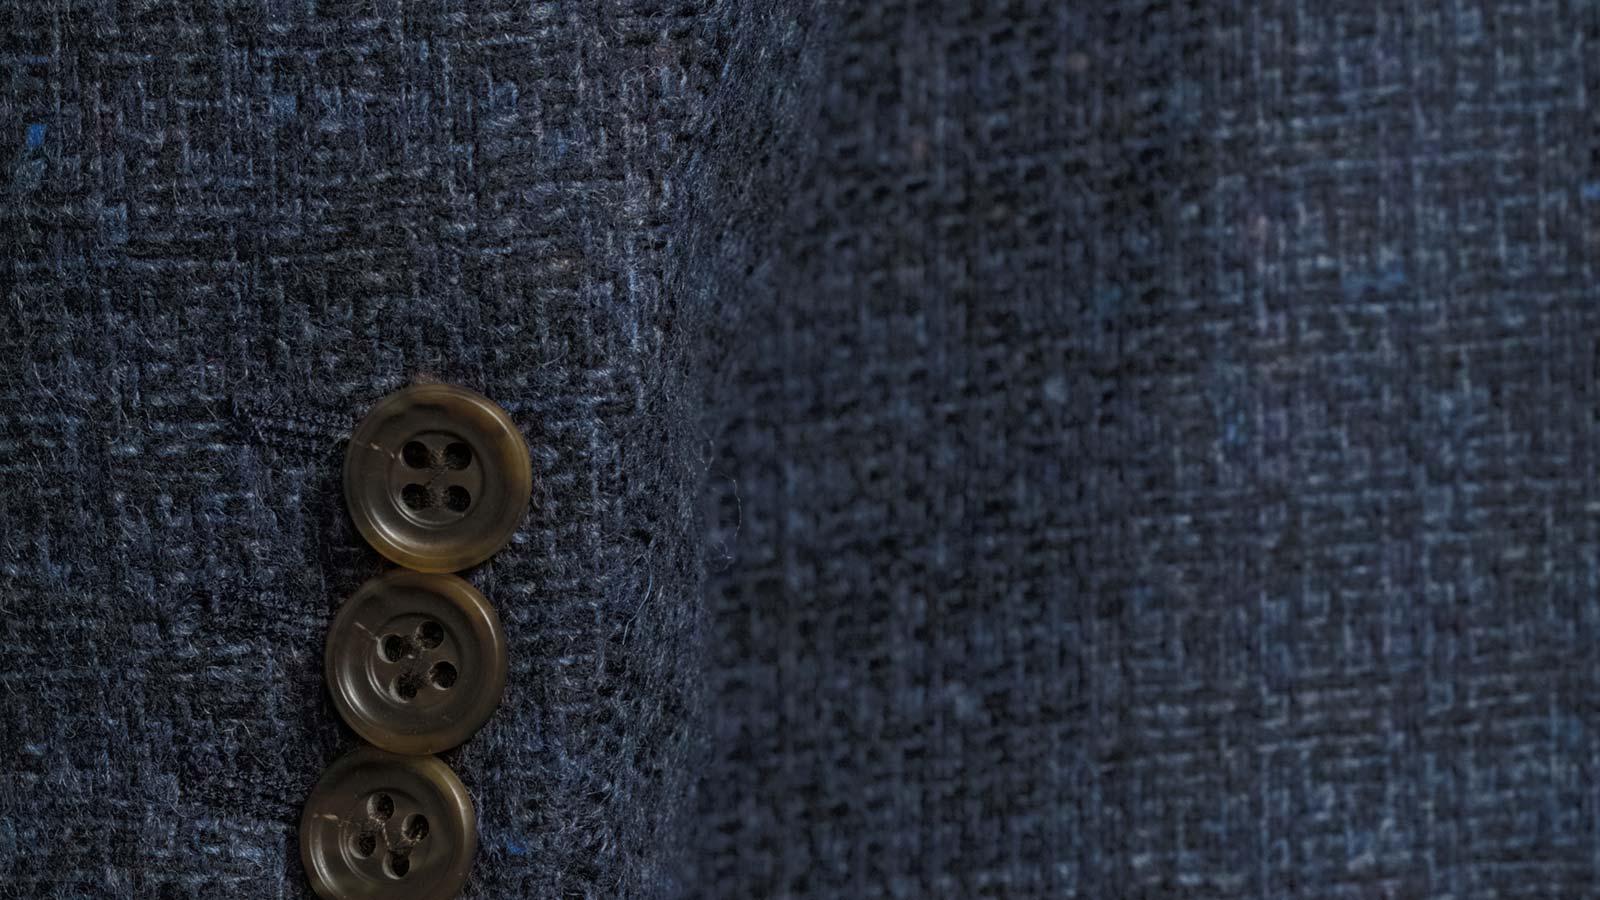 Navy Fine Check Tweed Blazer - slider image 1